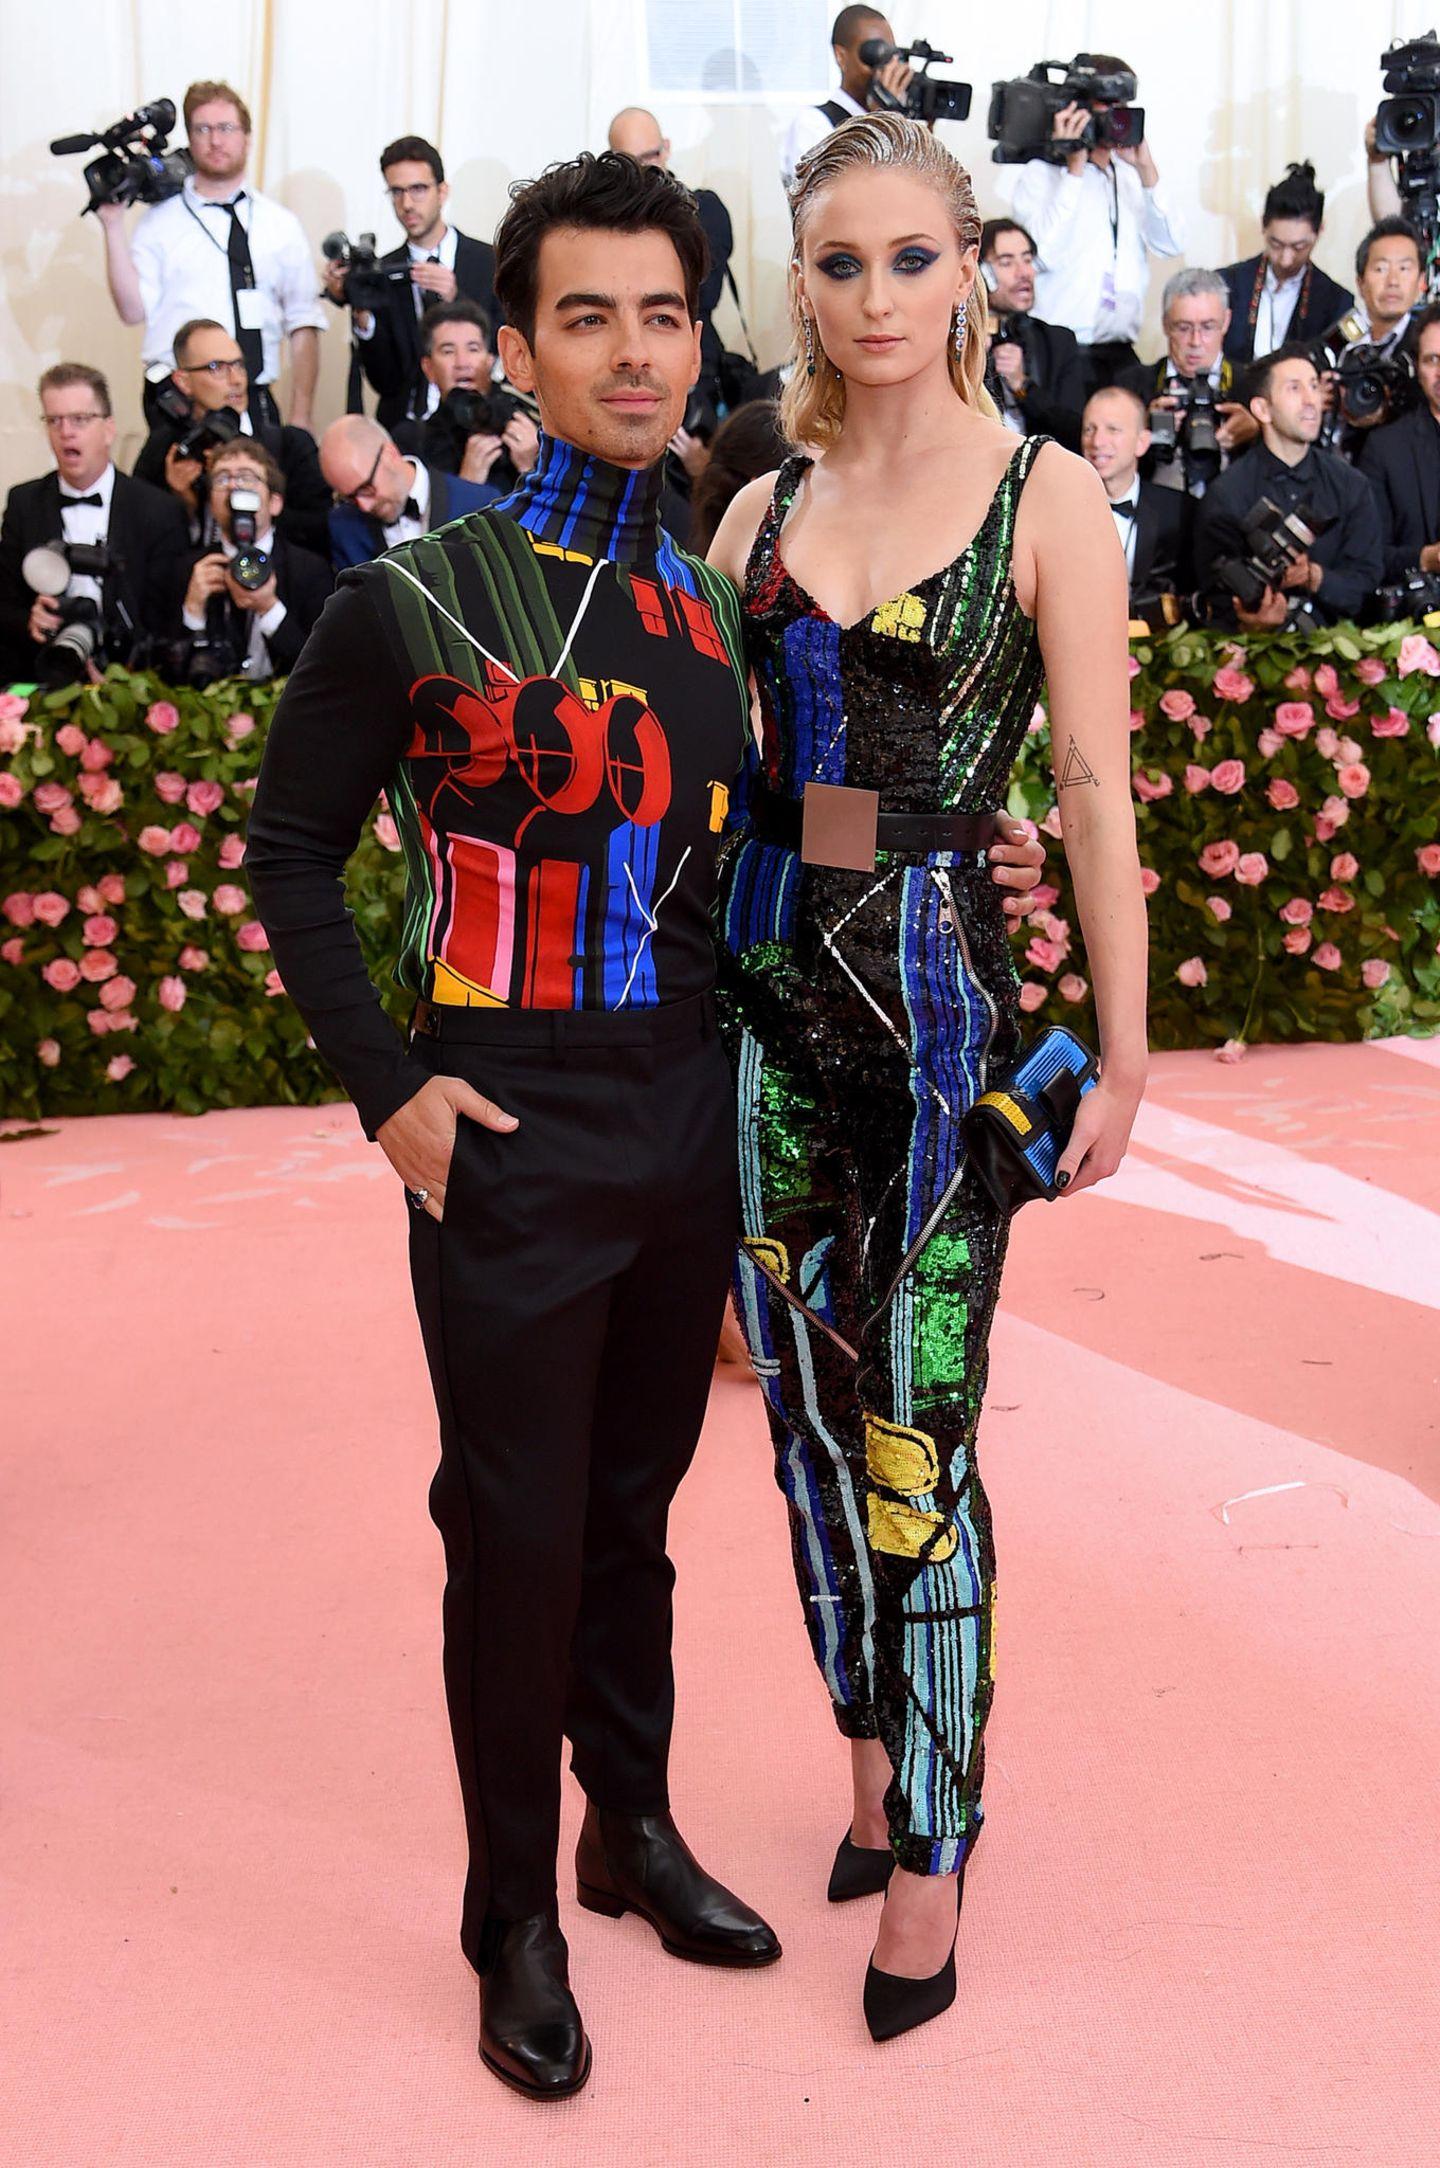 Pärchenlooks der Met Gala 2019: Sophie Turner und Joe Jonas